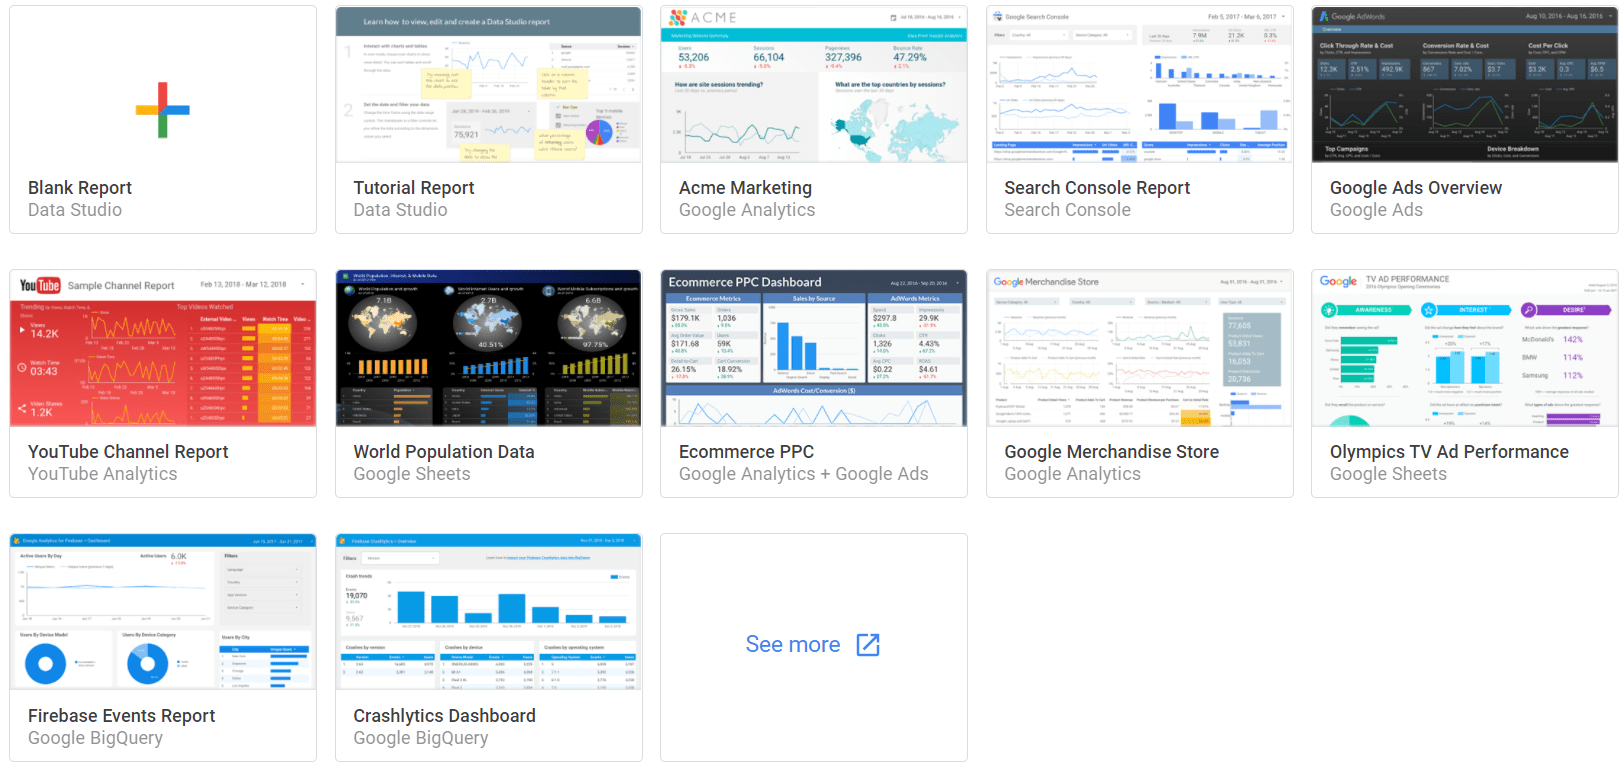 data studio template